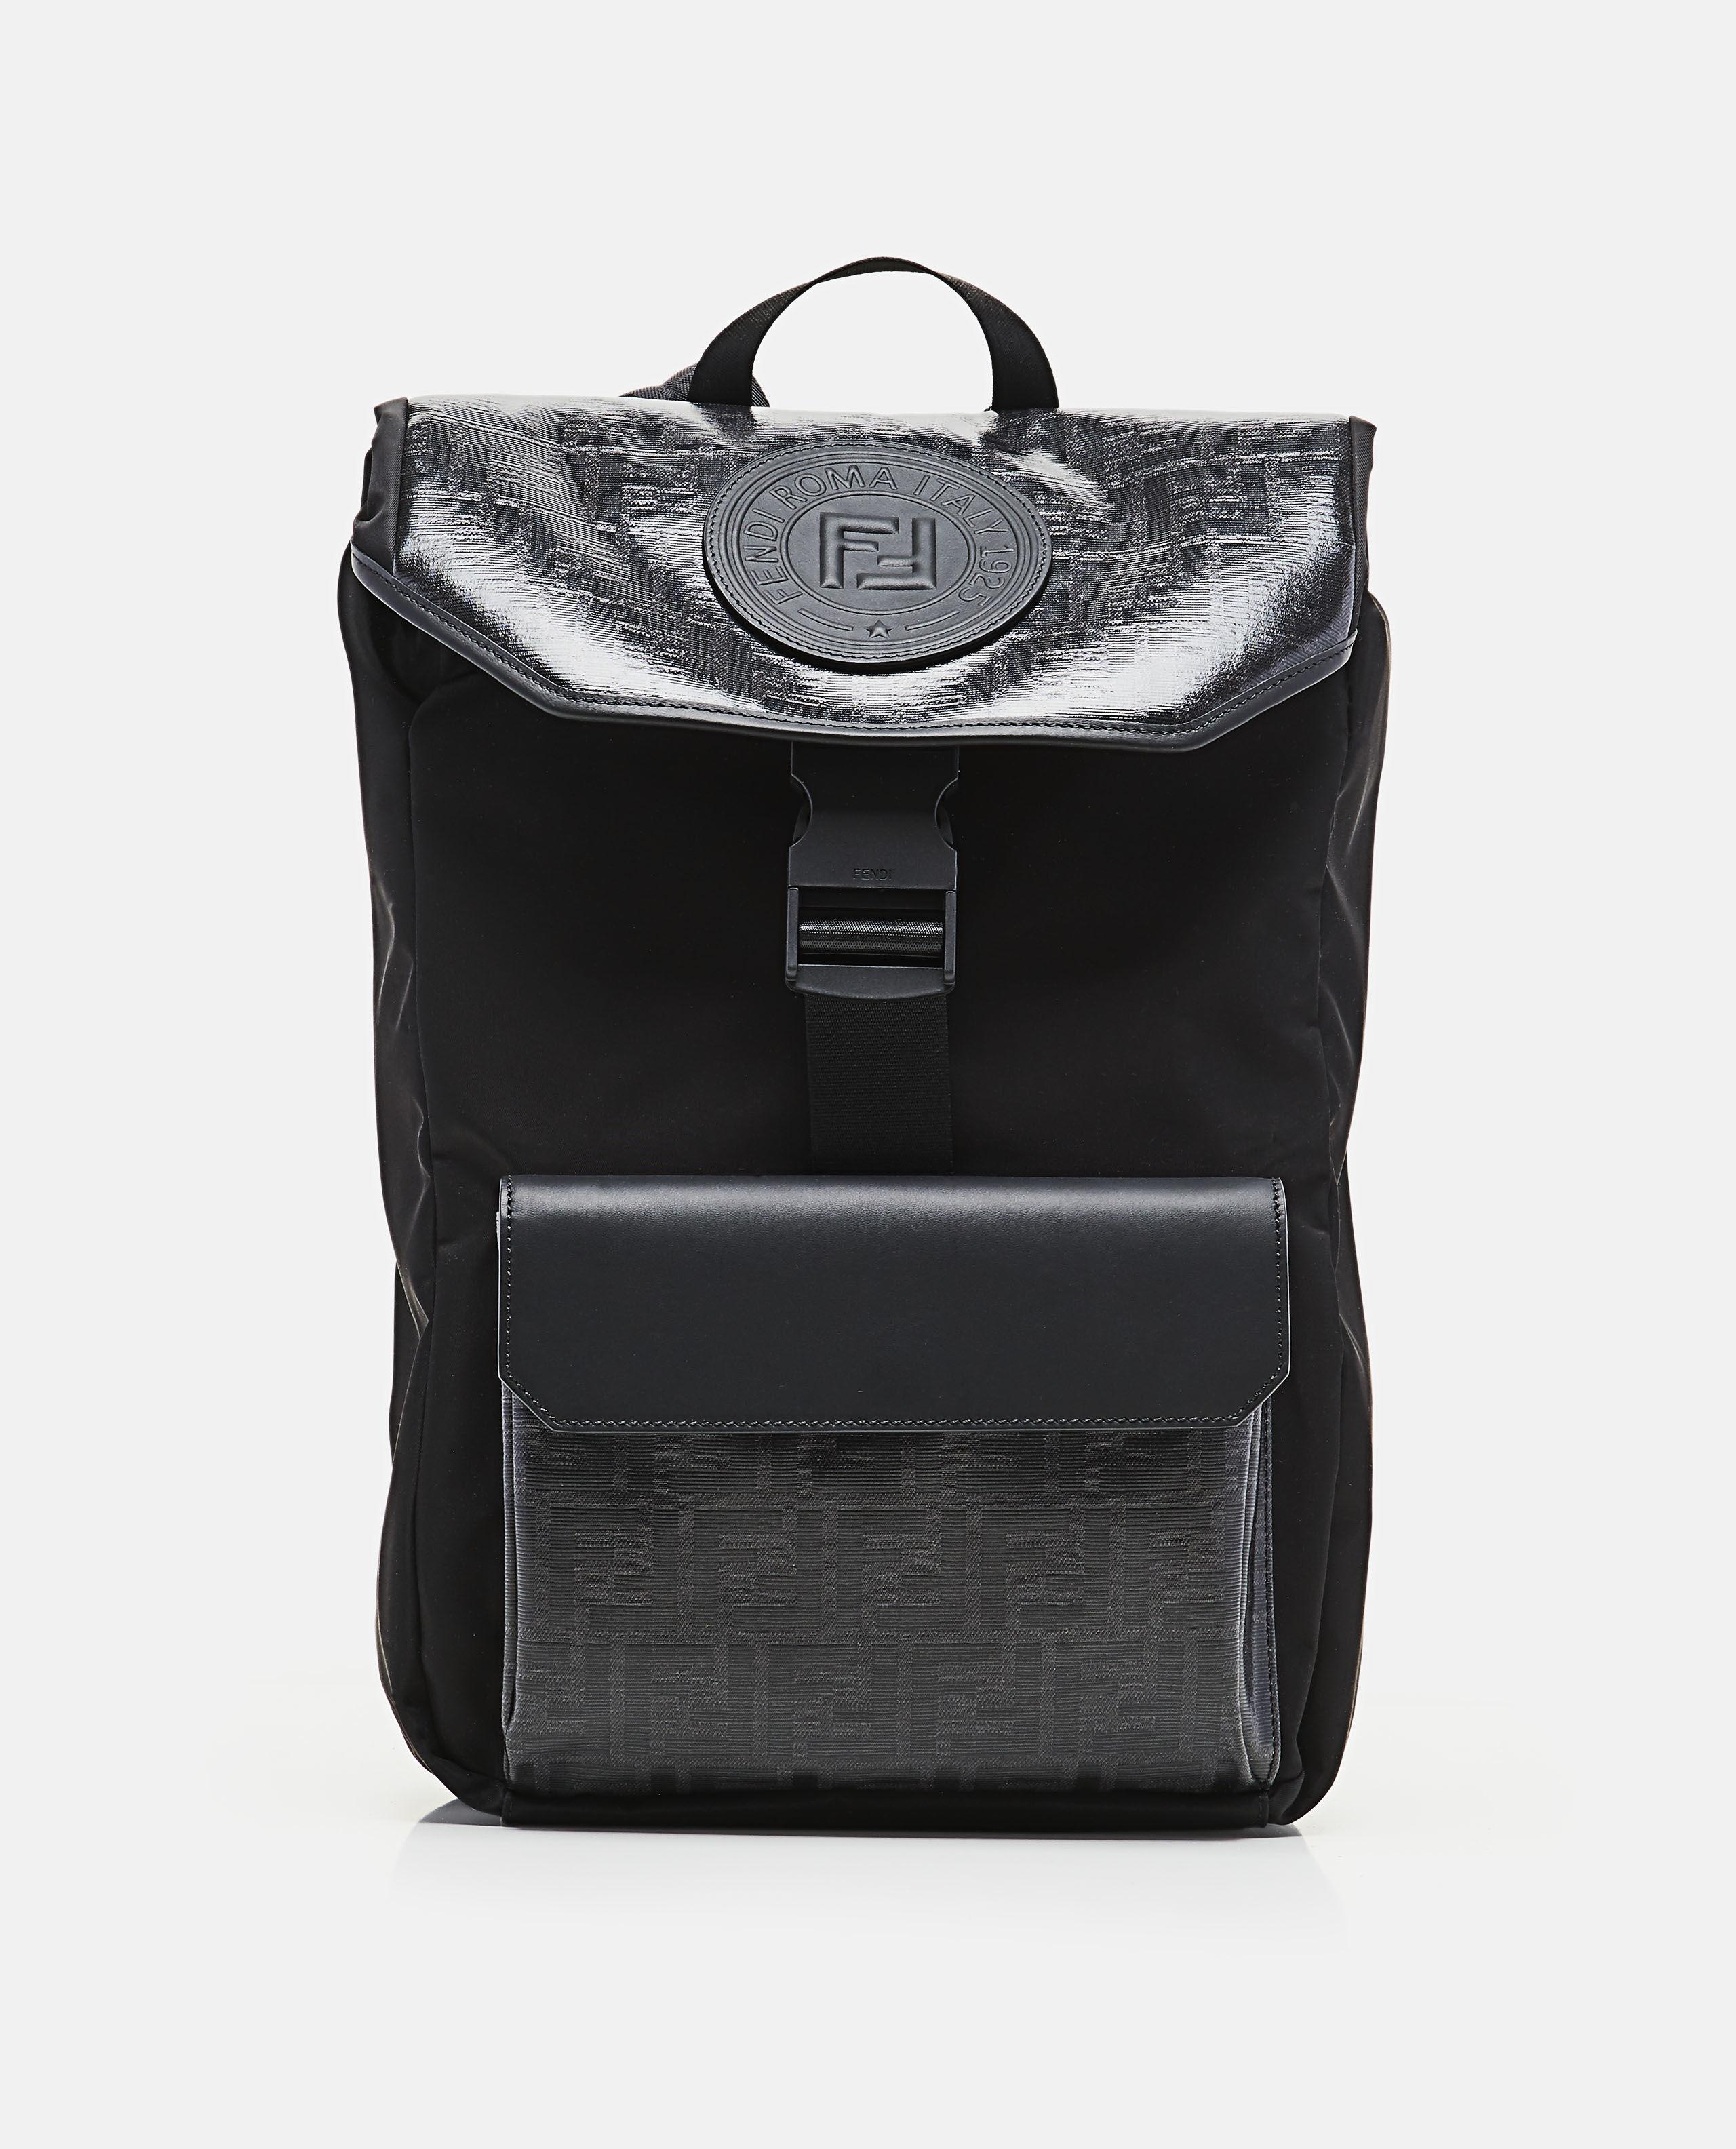 74146c52c4 Lyst - Fendi Fabric Backpack in Black for Men